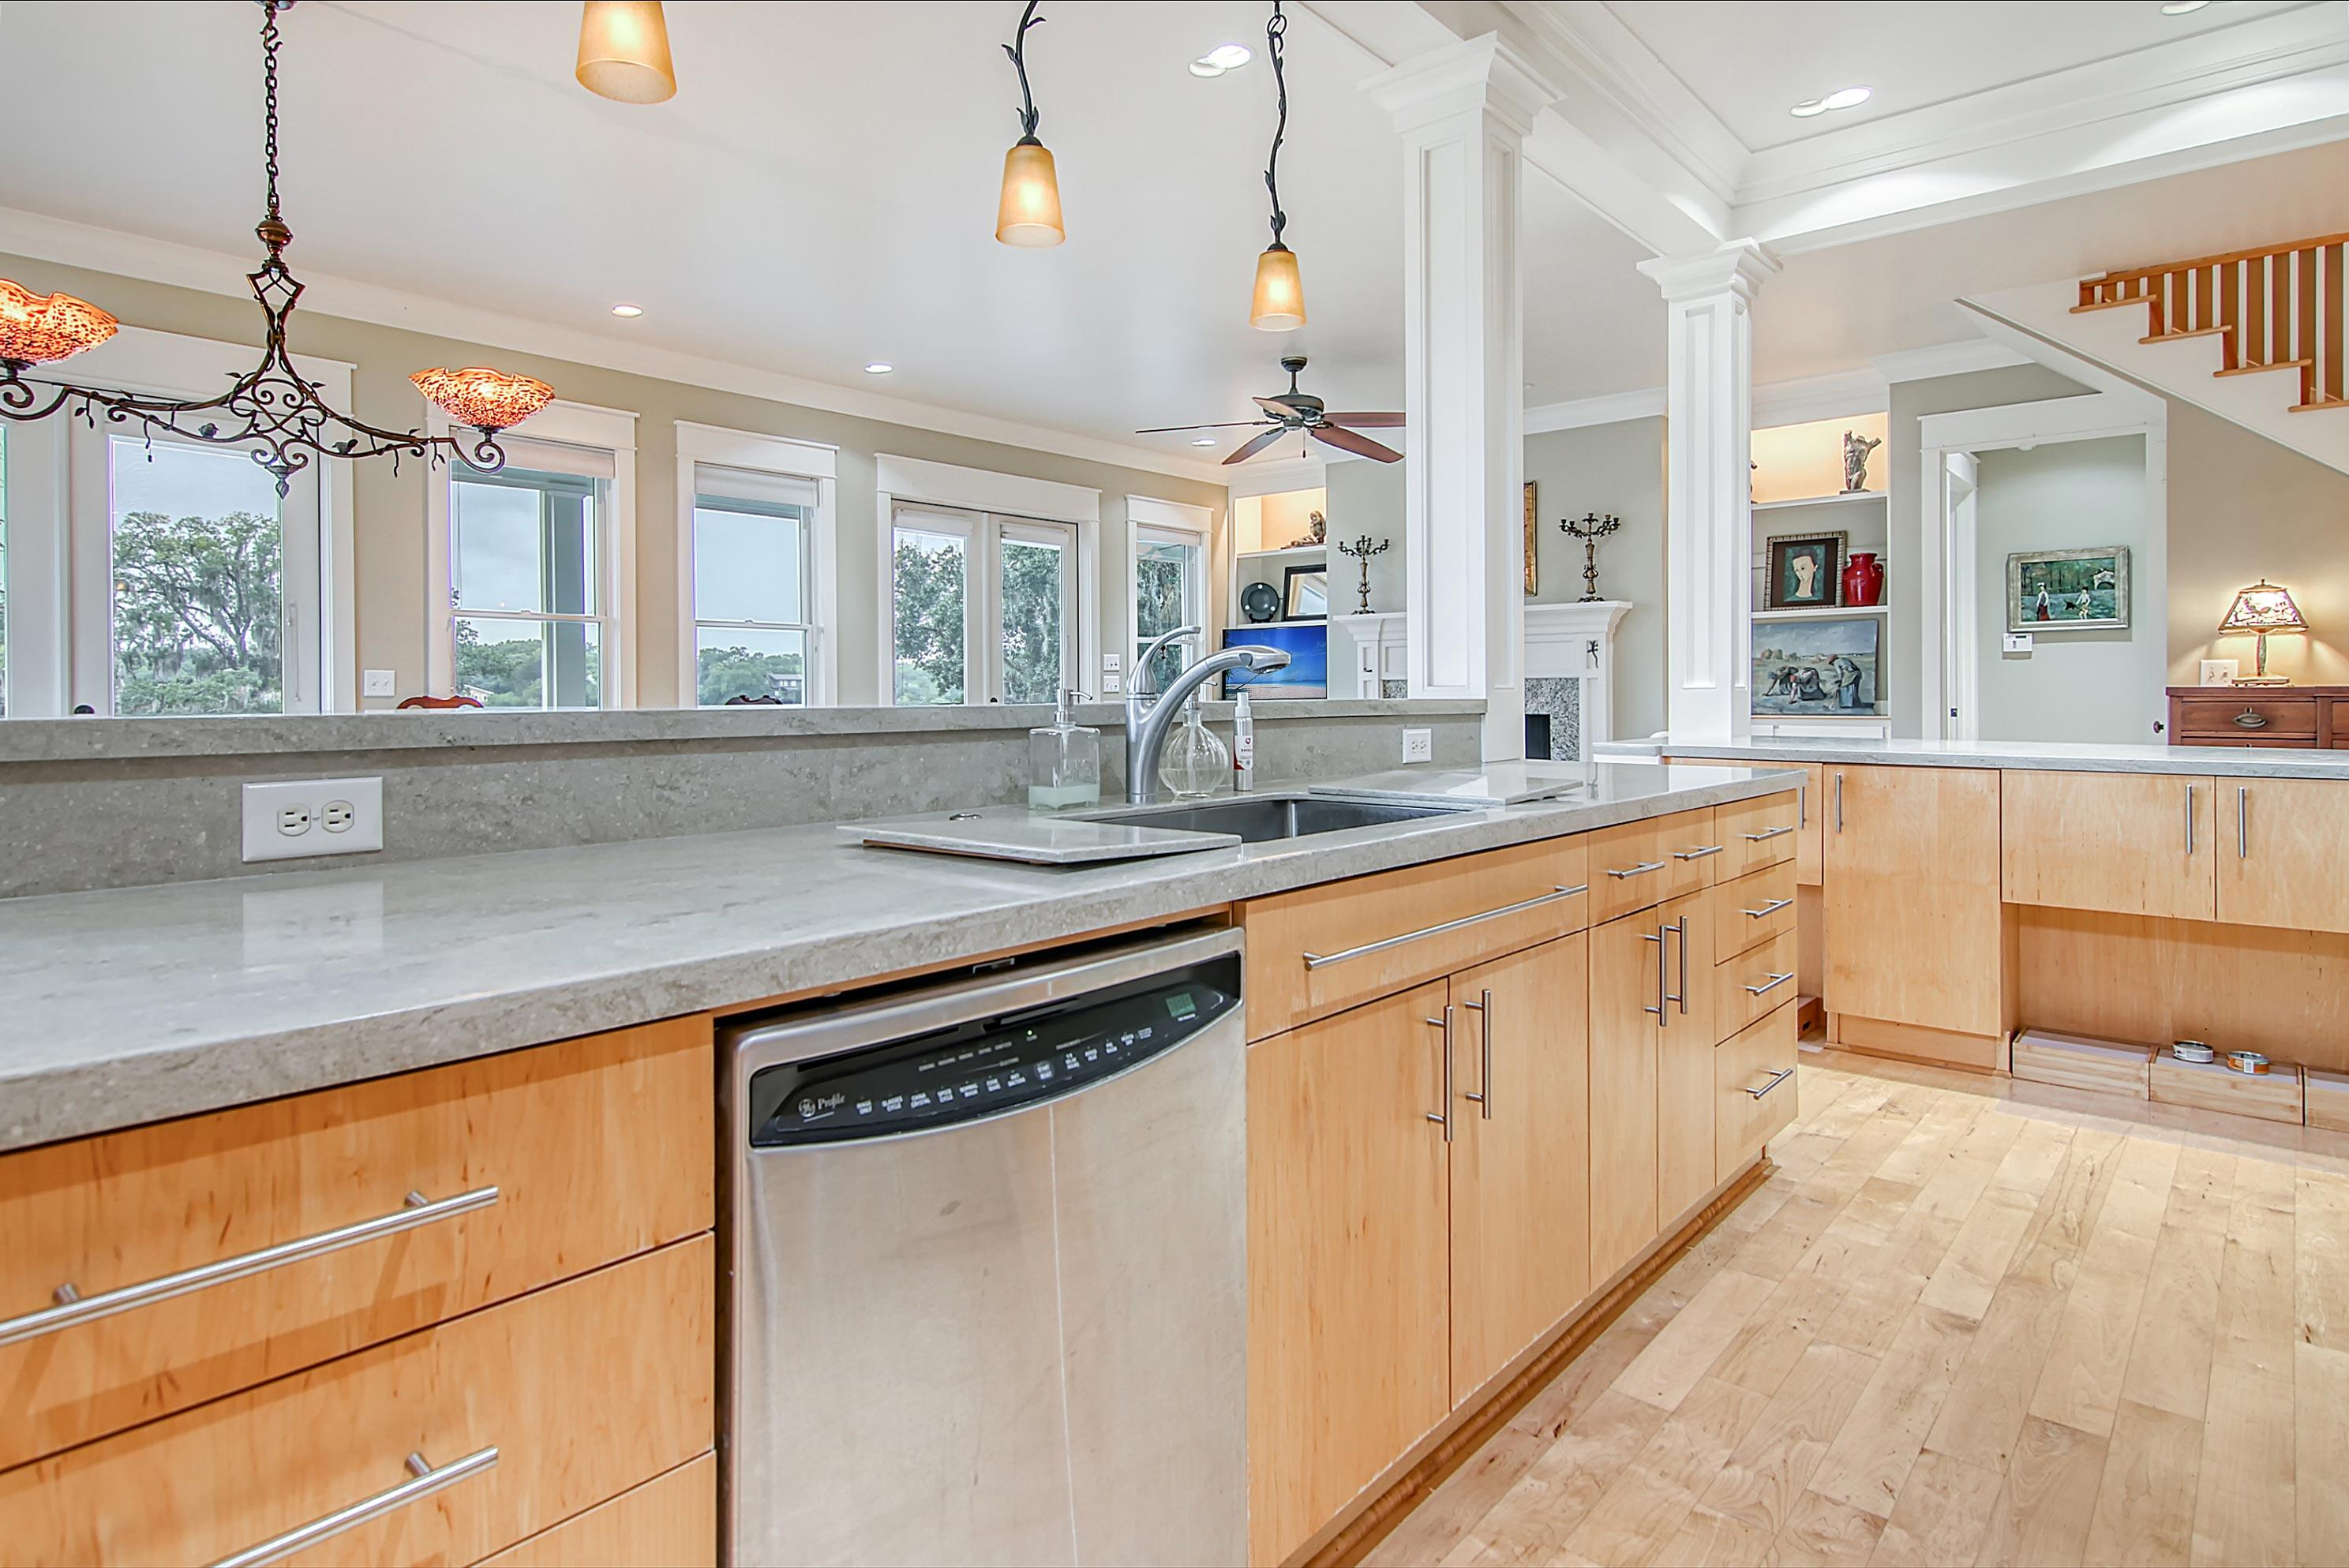 Scanlonville Homes For Sale - 152 6th, Mount Pleasant, SC - 52